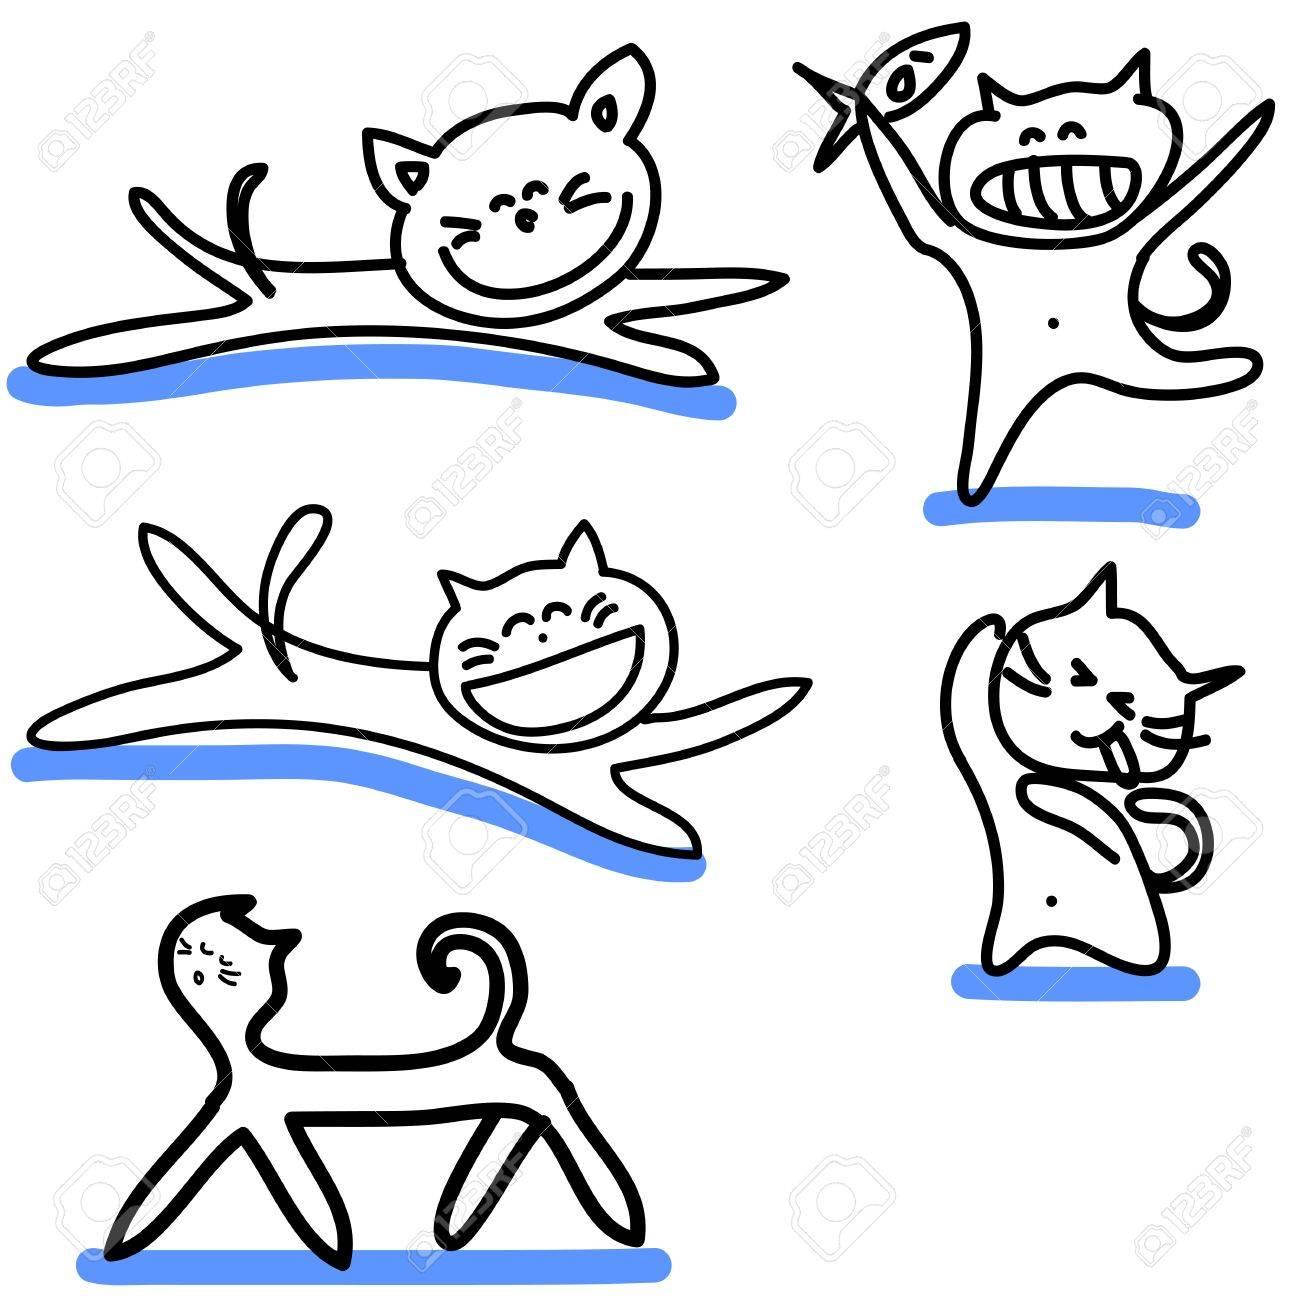 cartoon funny cats hand-drawn illustration Stock Vector - 16544286